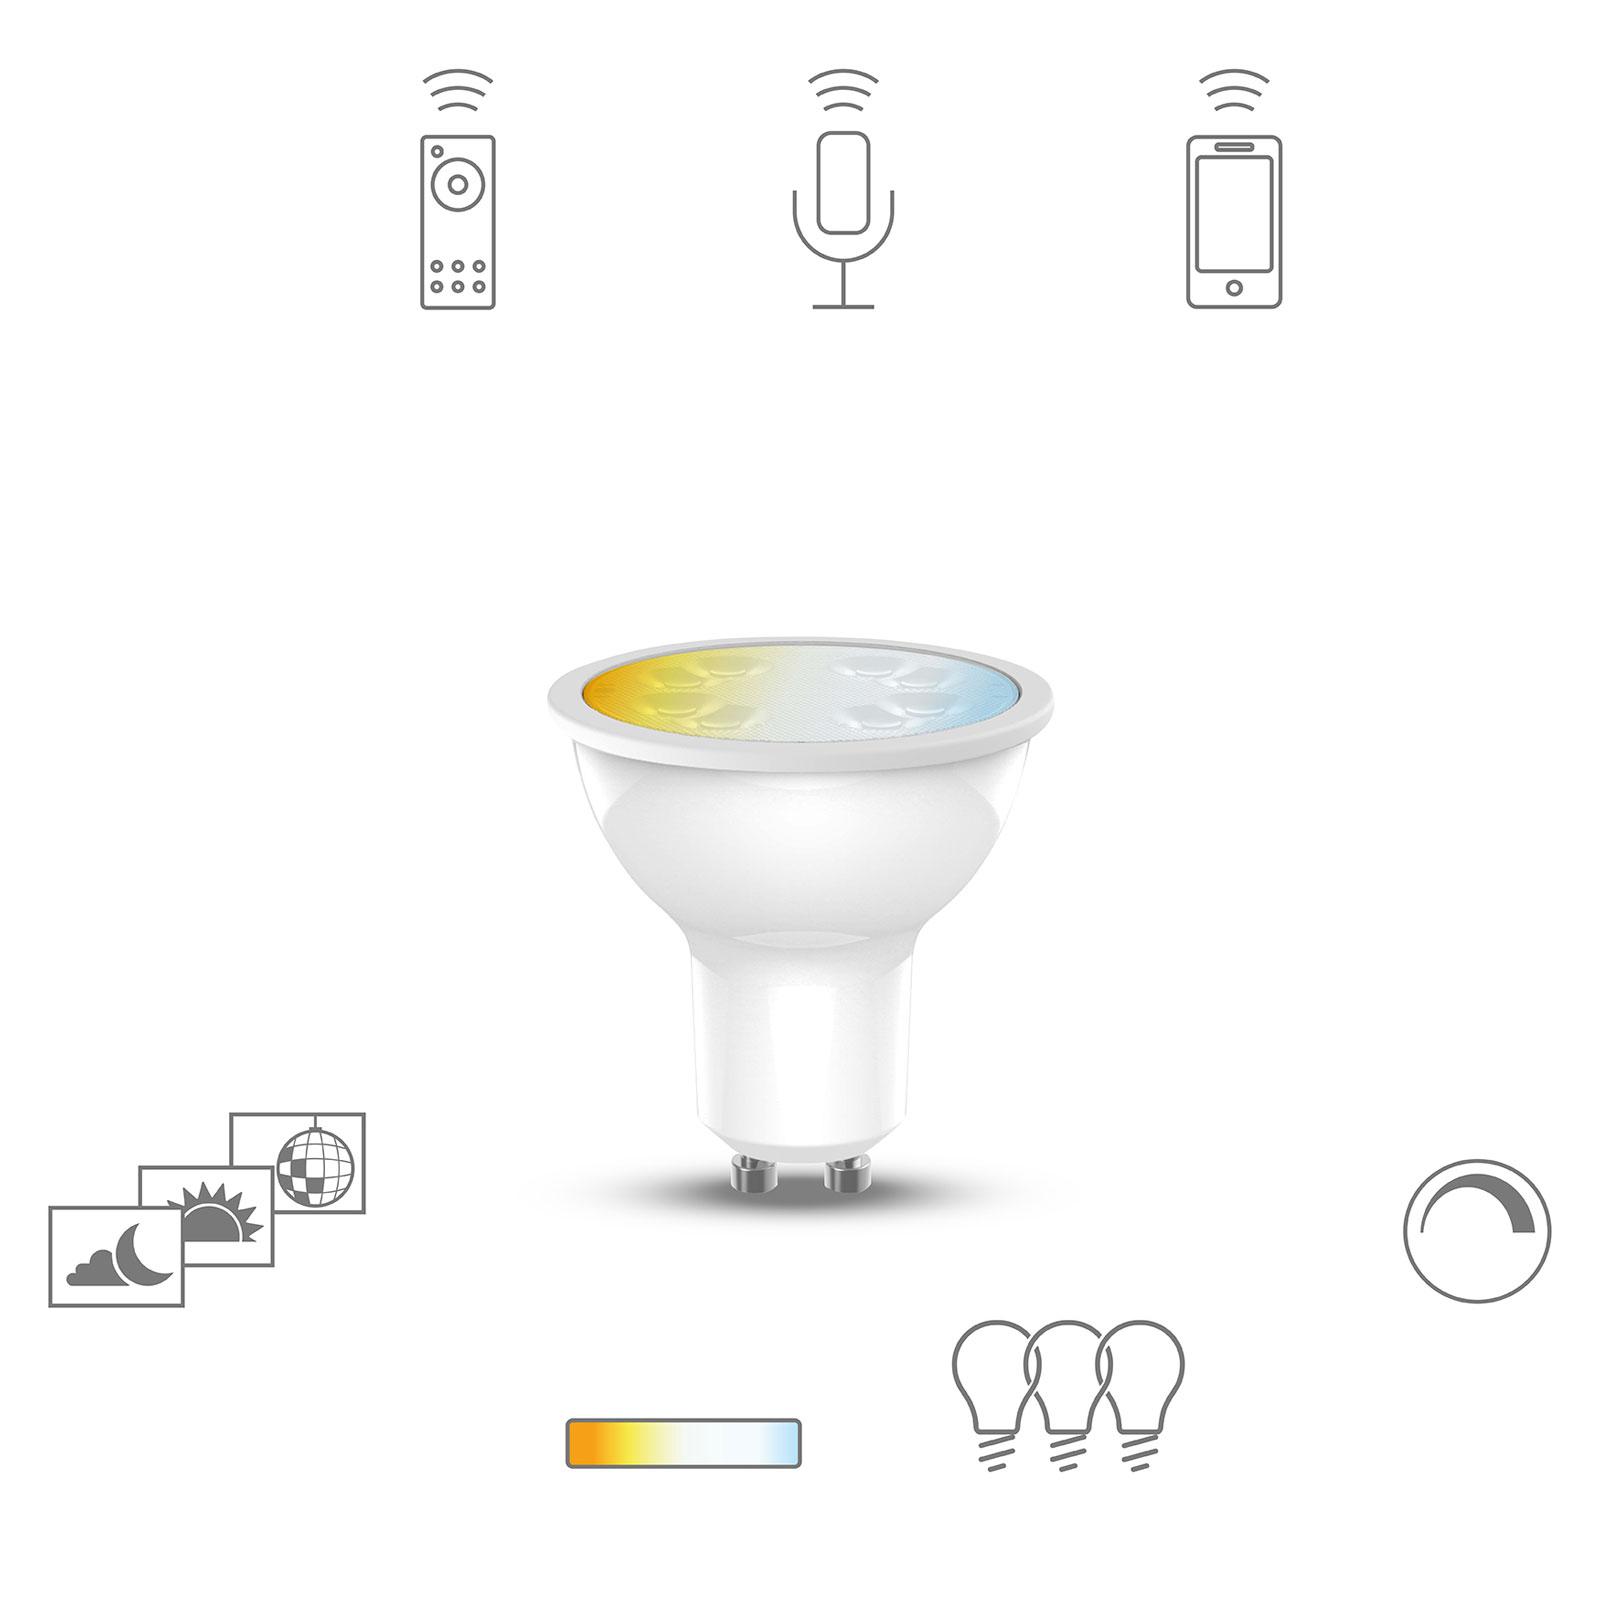 Müller Licht tint white LED-reflektor GU10 5W CCT